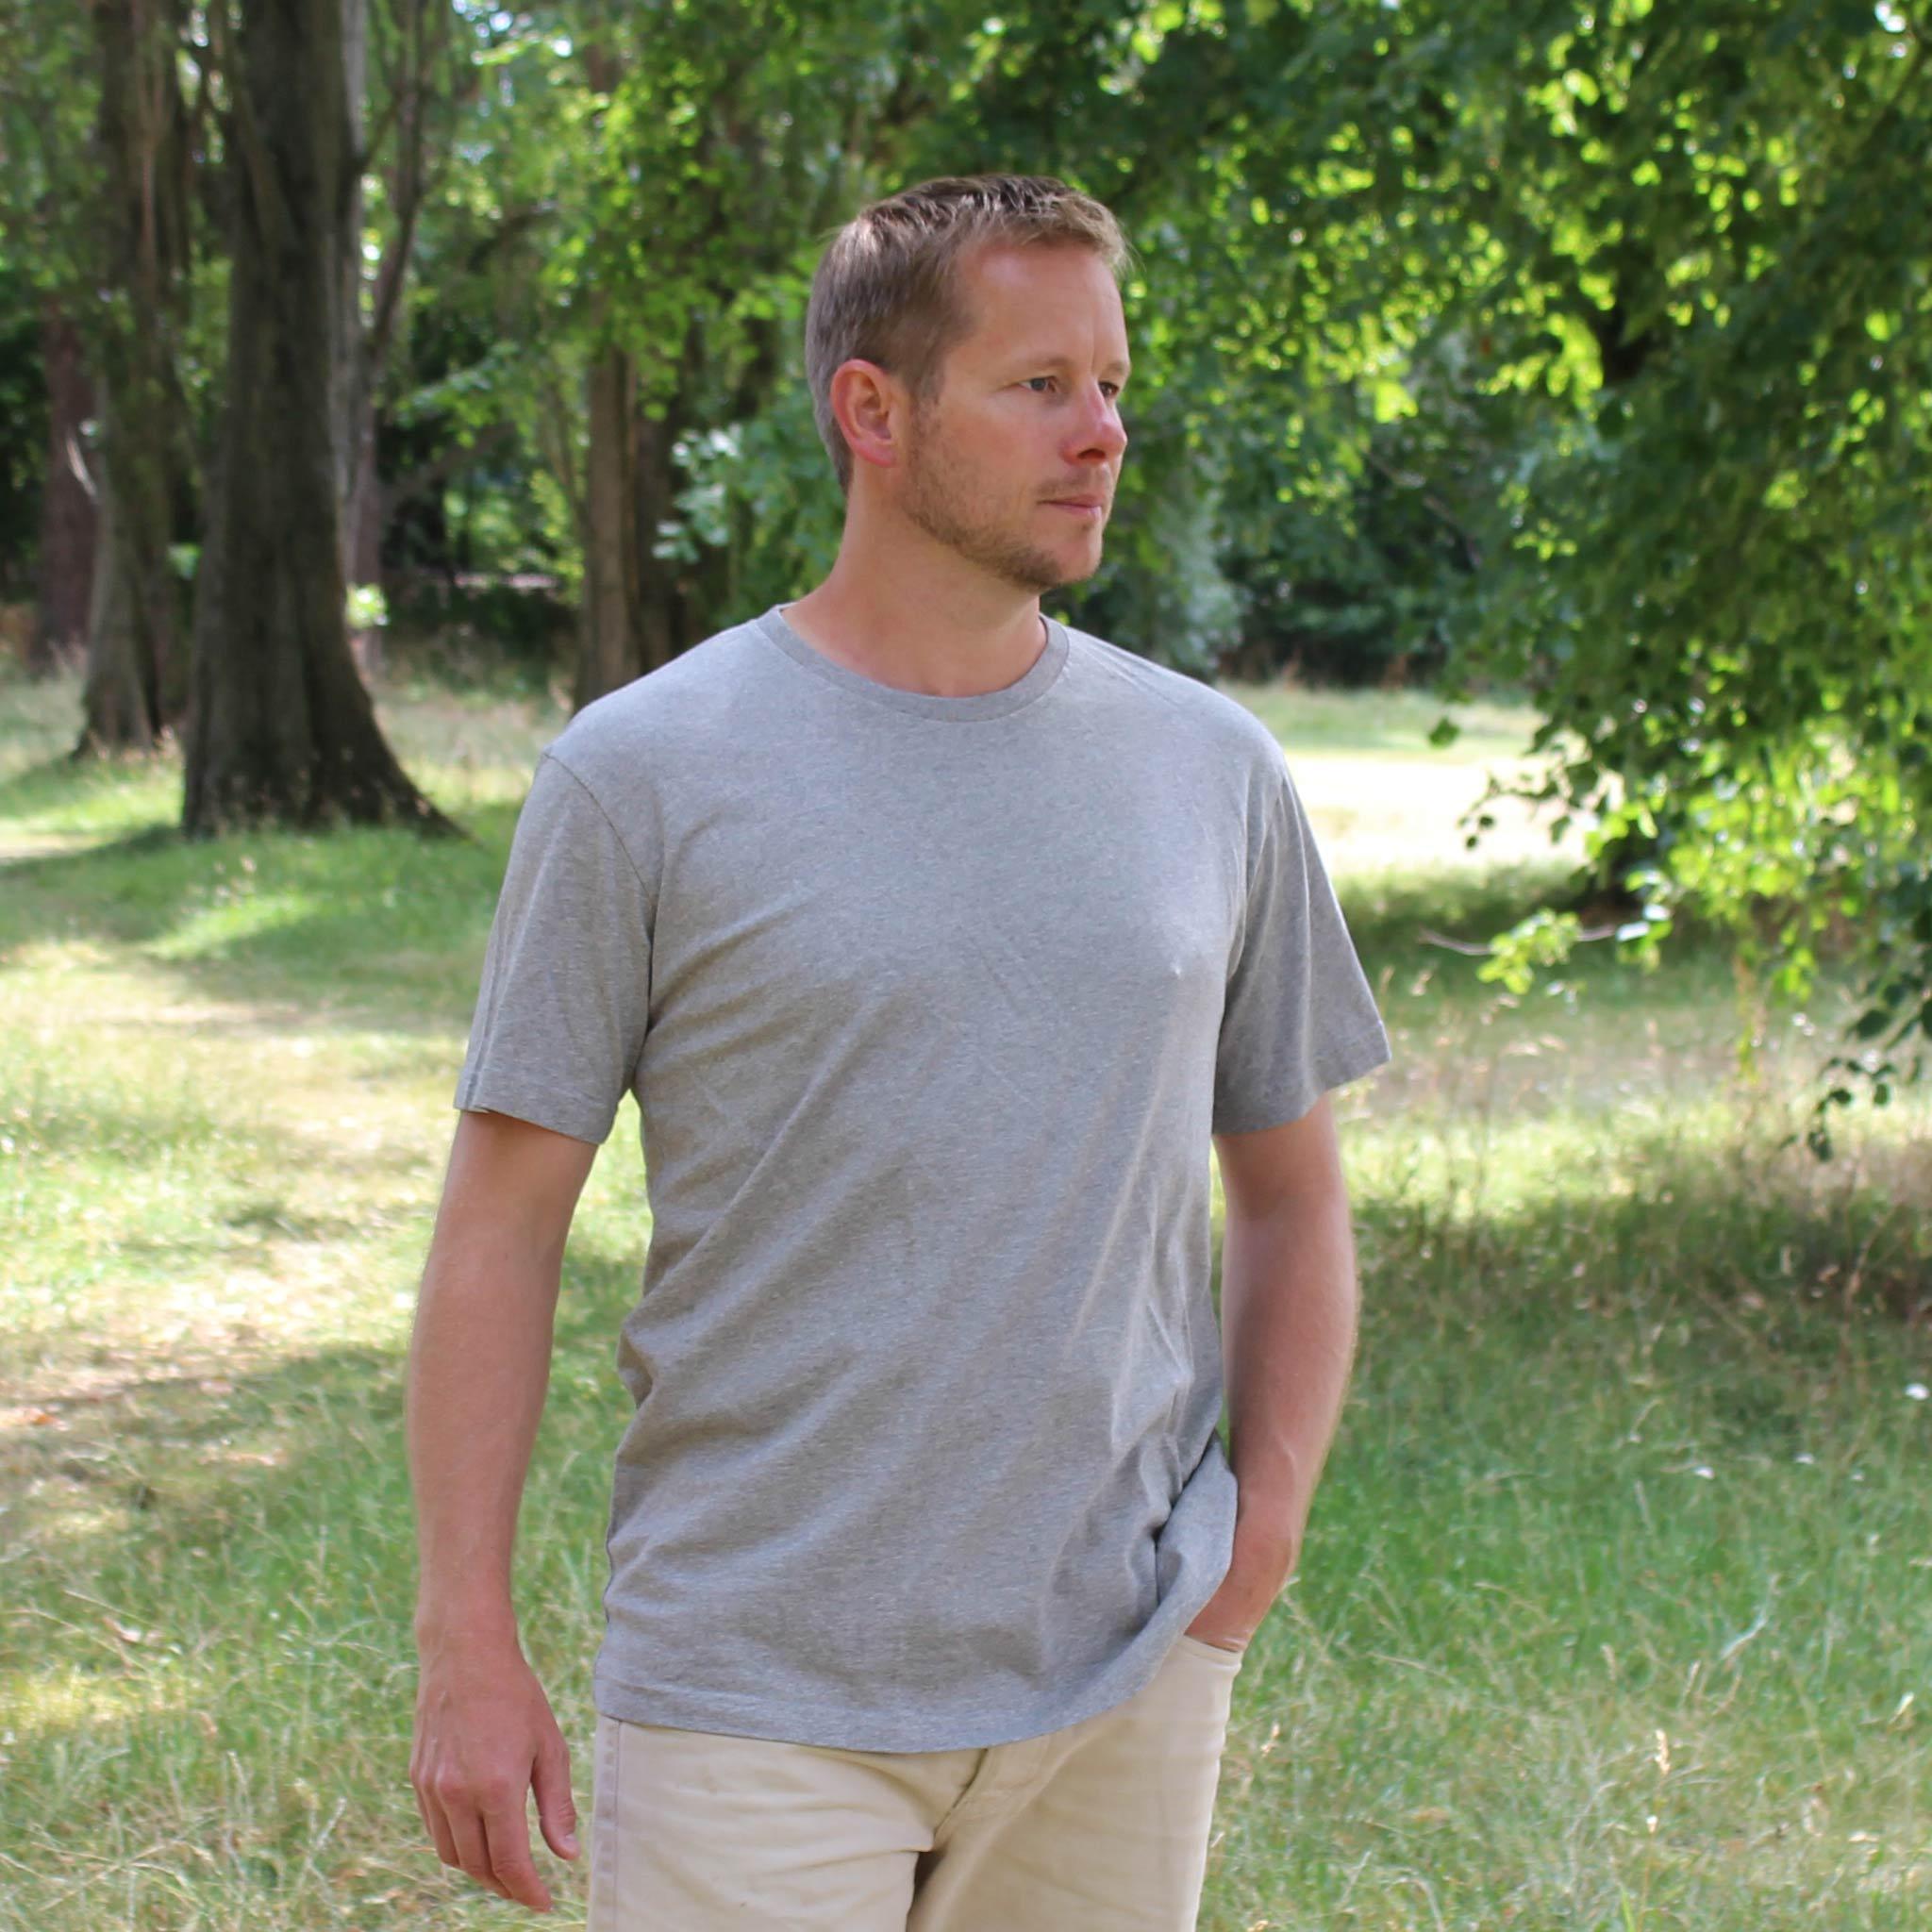 Plain Grey T-shirt model